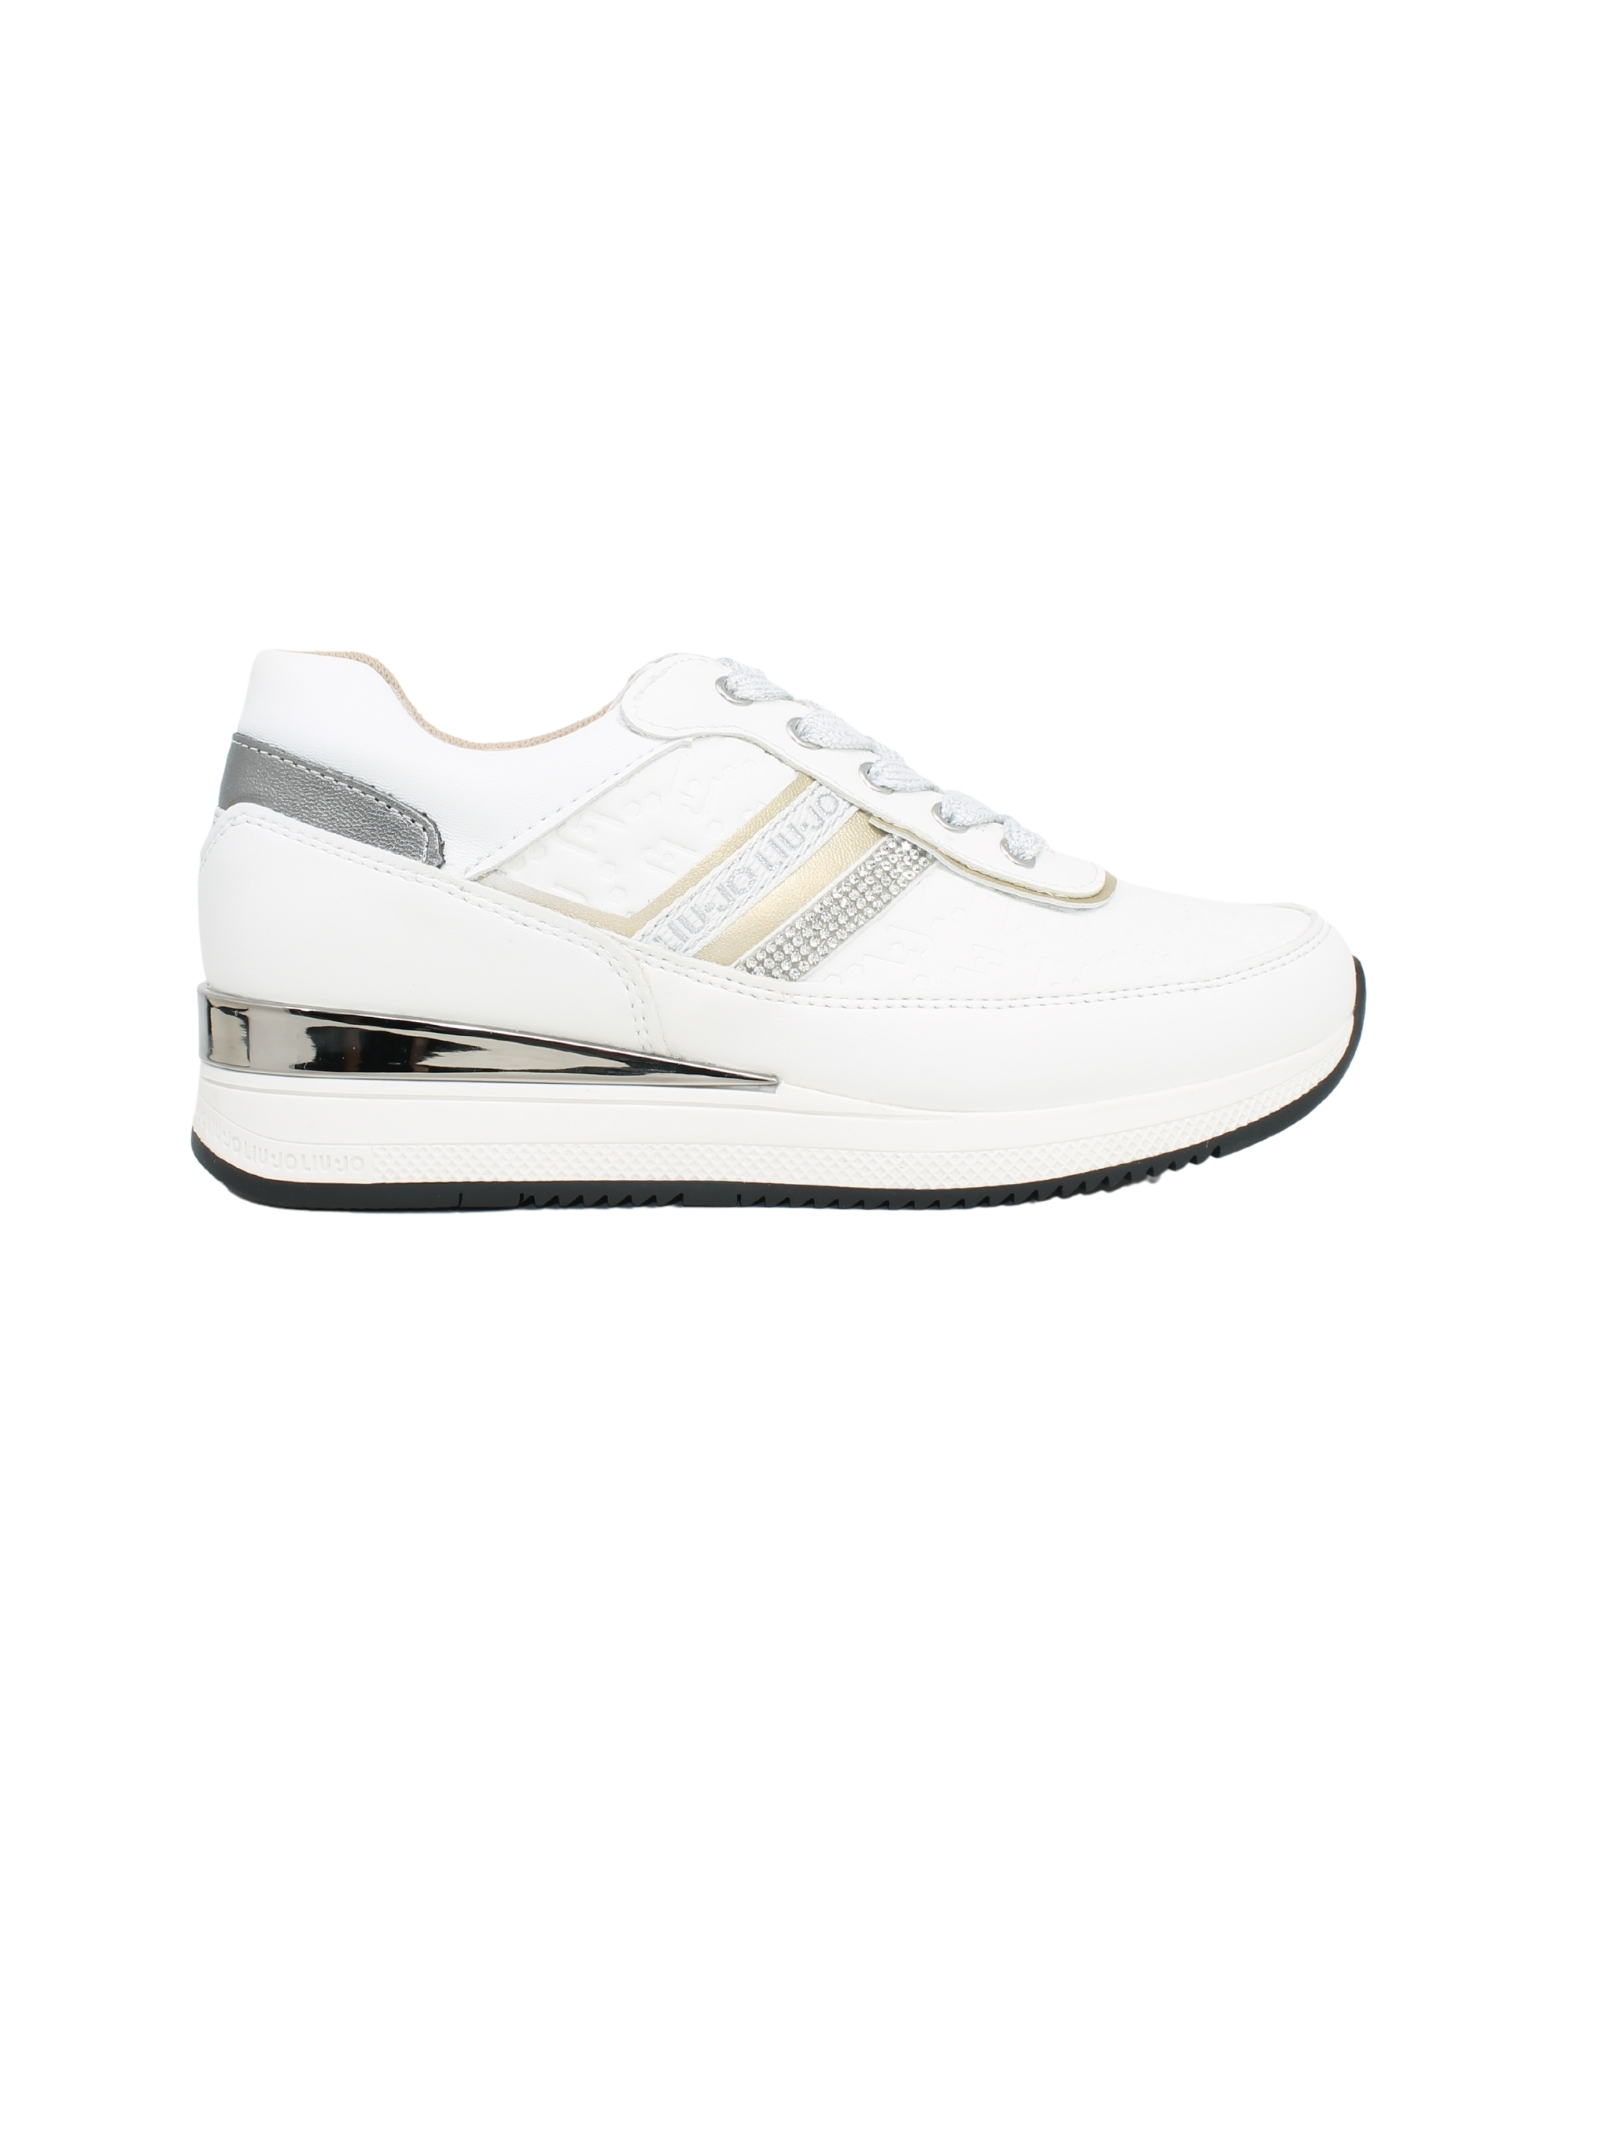 Connie Sneakers for Girls LIU-JO JUNIOR | Sneakers | 4F1735EX01401111